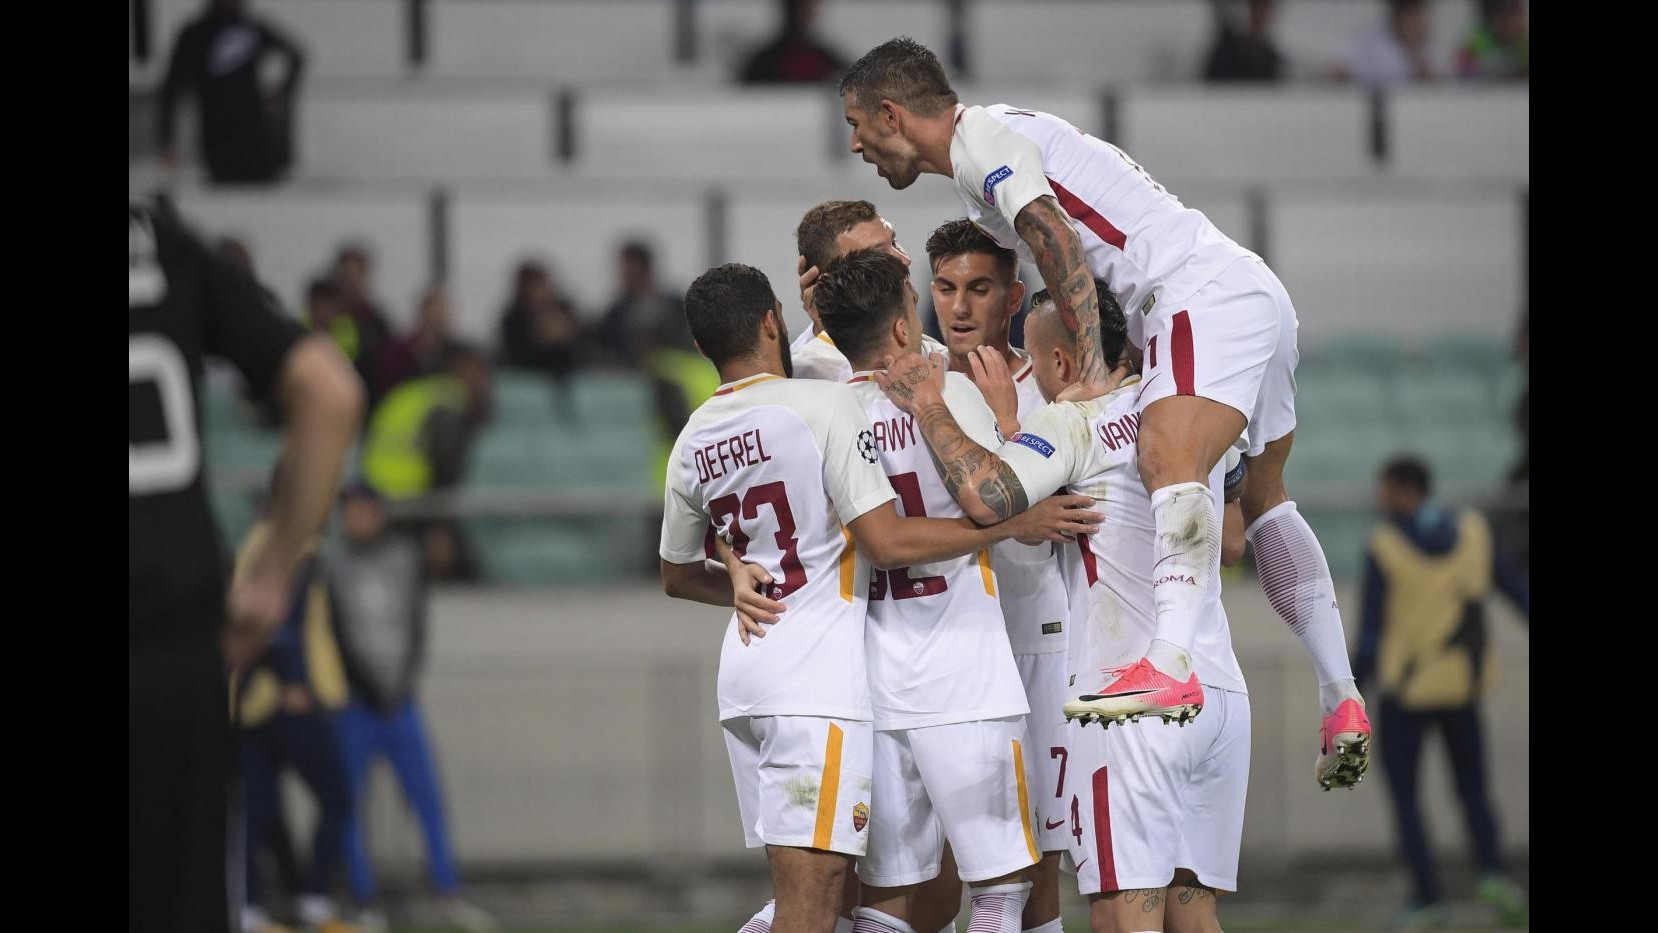 Champions League, Qarabag-Roma 1-2: il fotoracconto